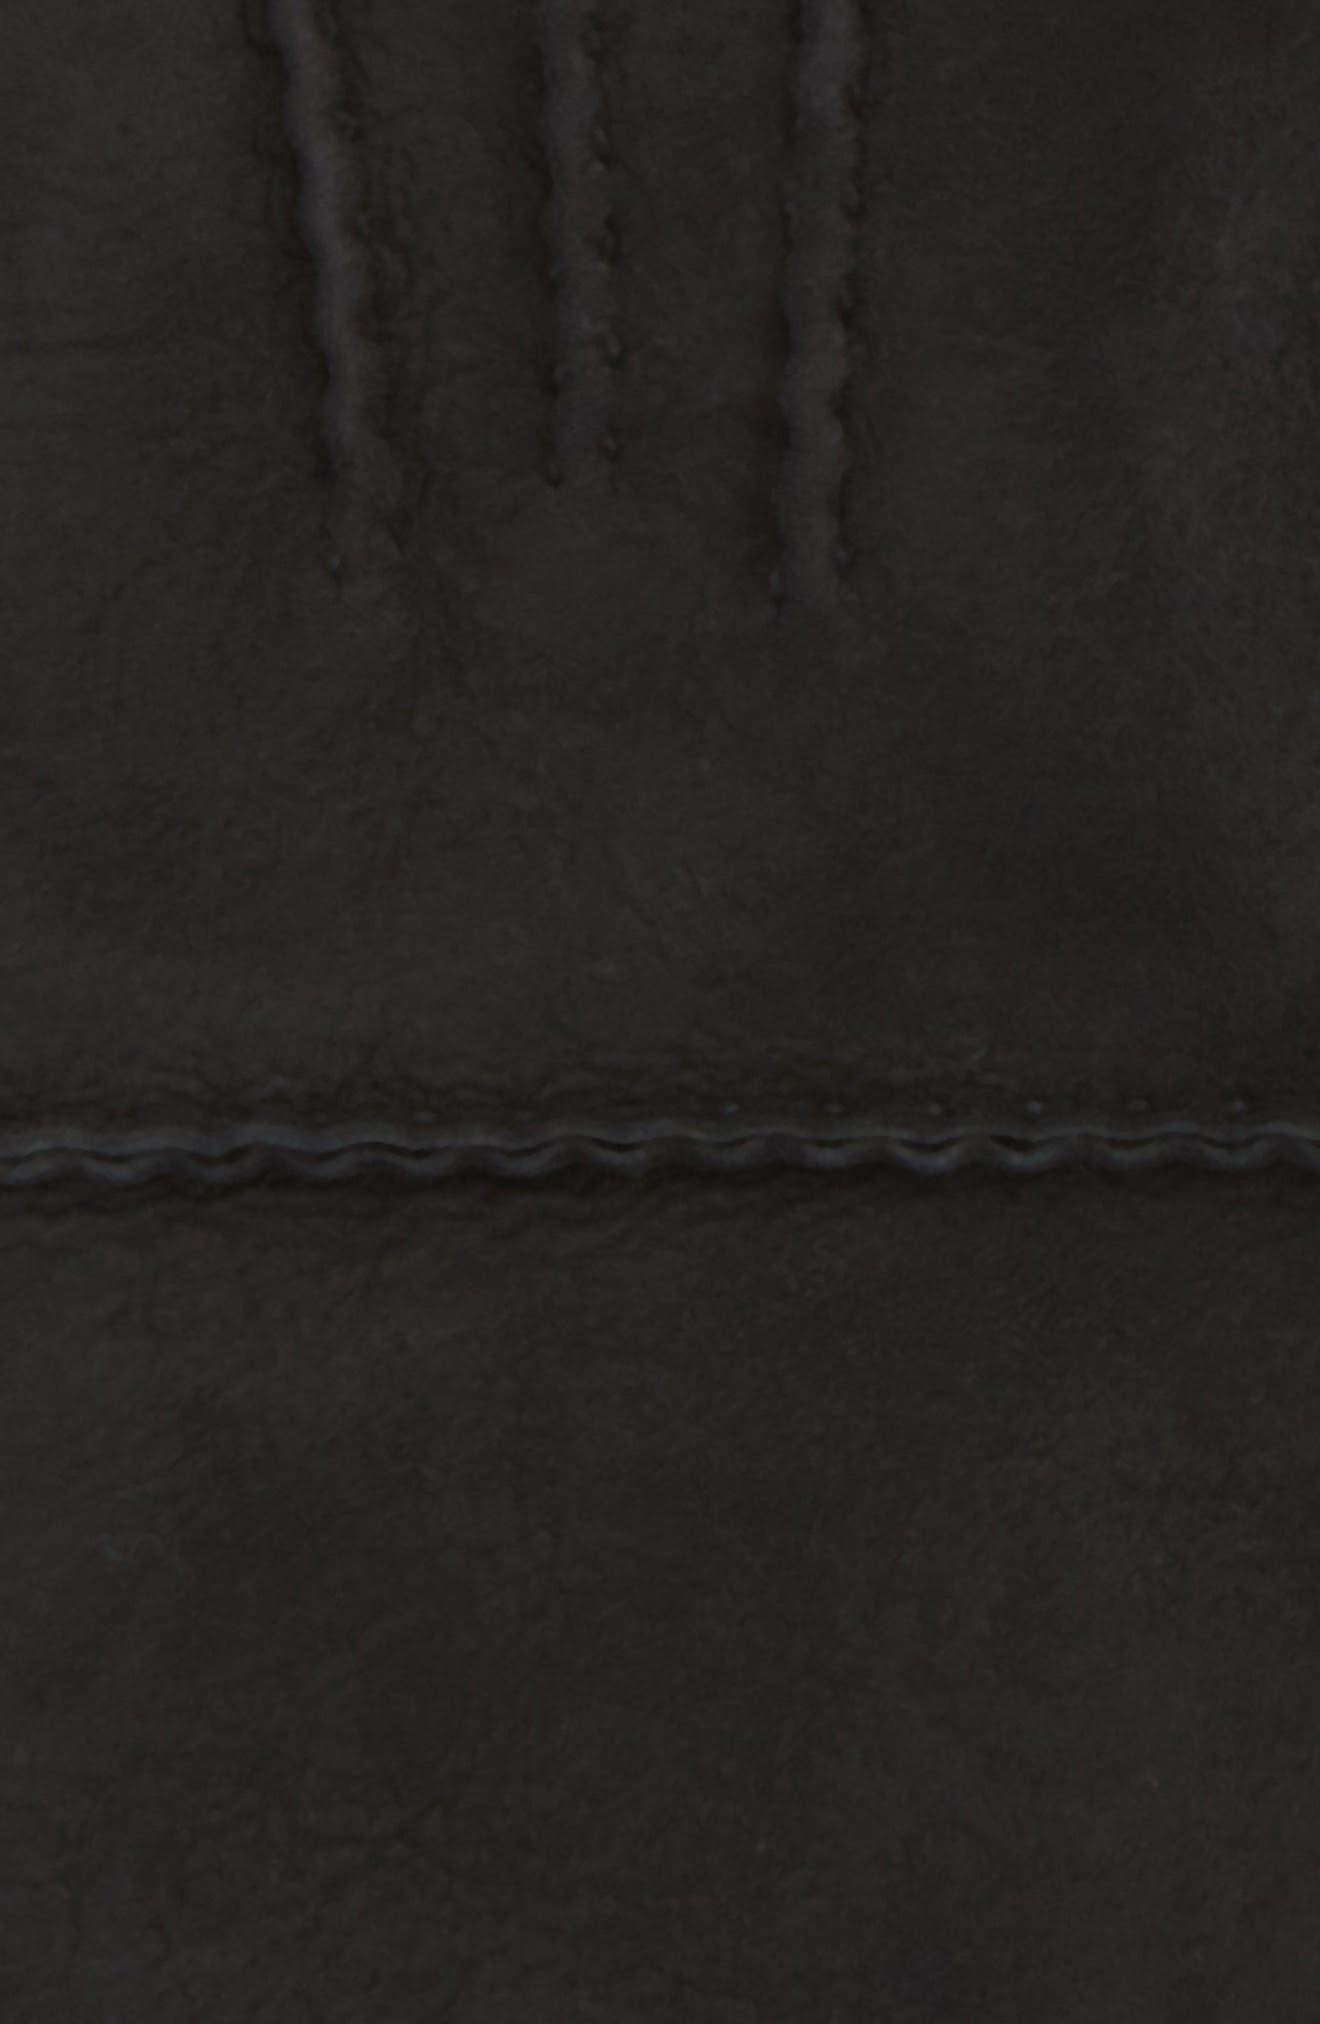 UGG<sup>®</sup> Long Slim Genuine Shearling Gloves,                             Alternate thumbnail 2, color,                             Black